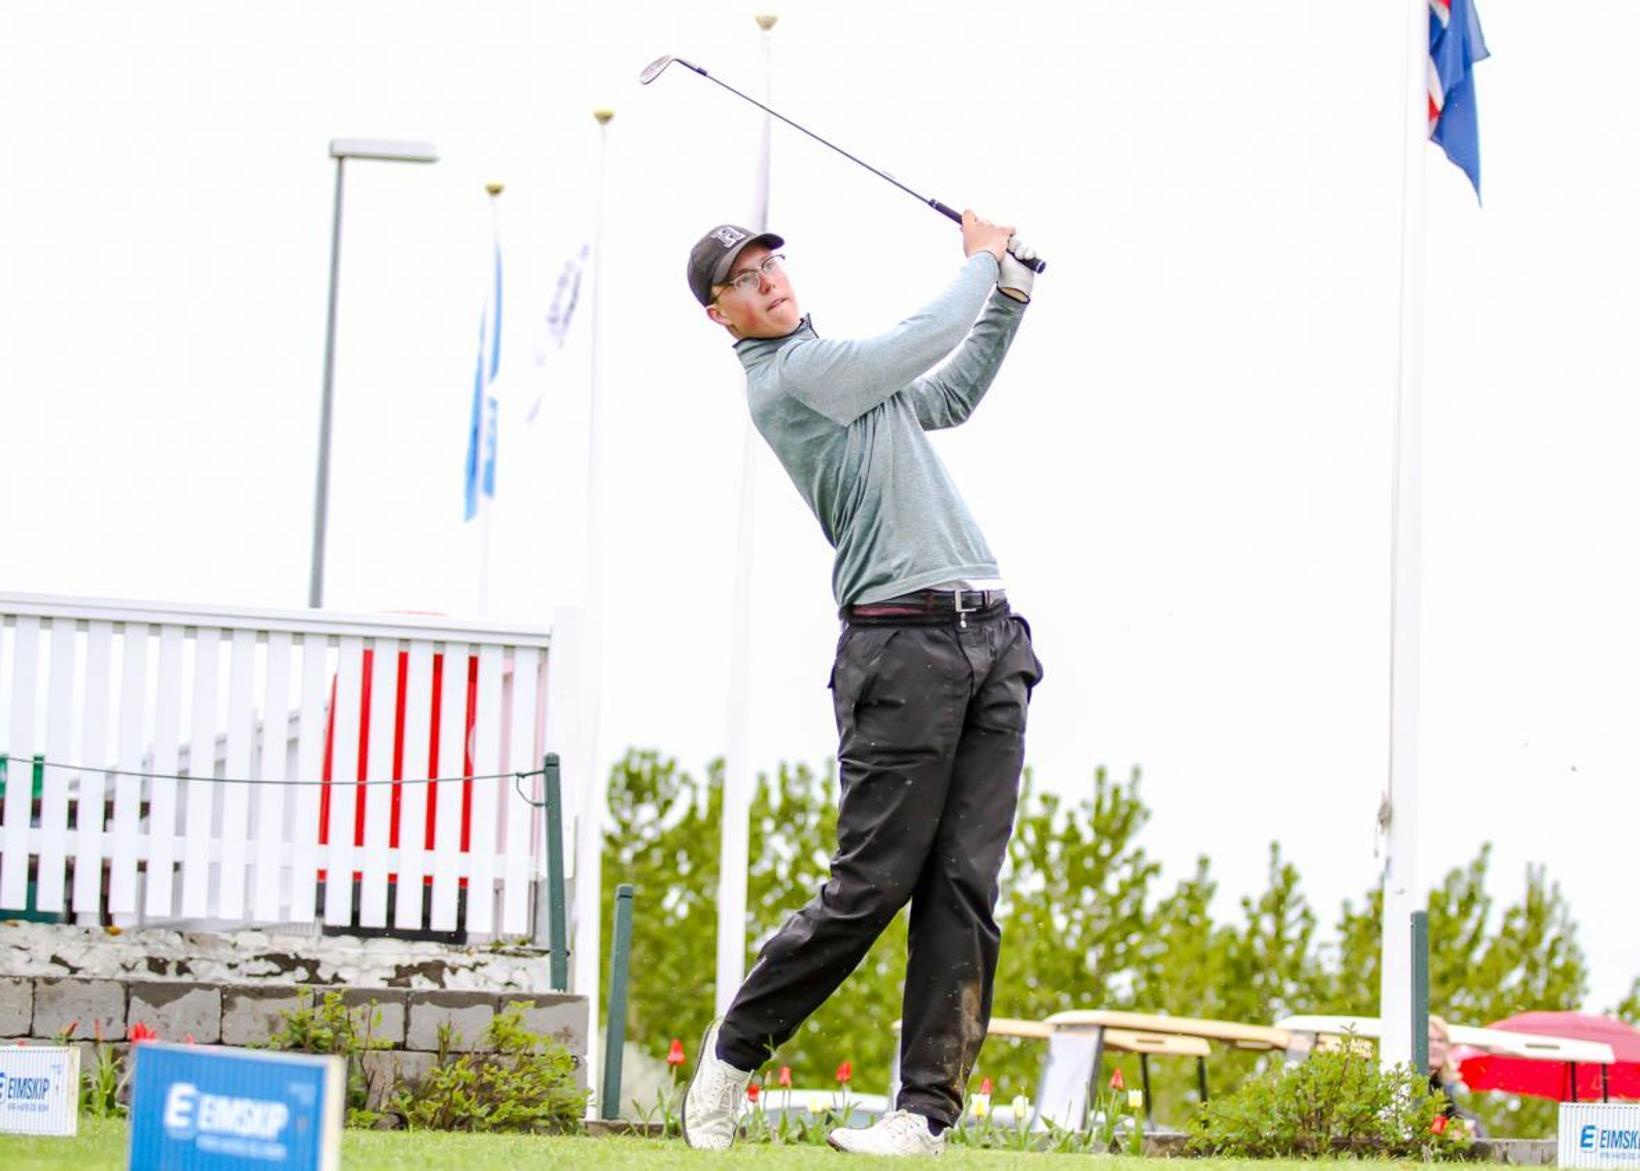 Jóhannes Guðmundsson er mikill golfari.